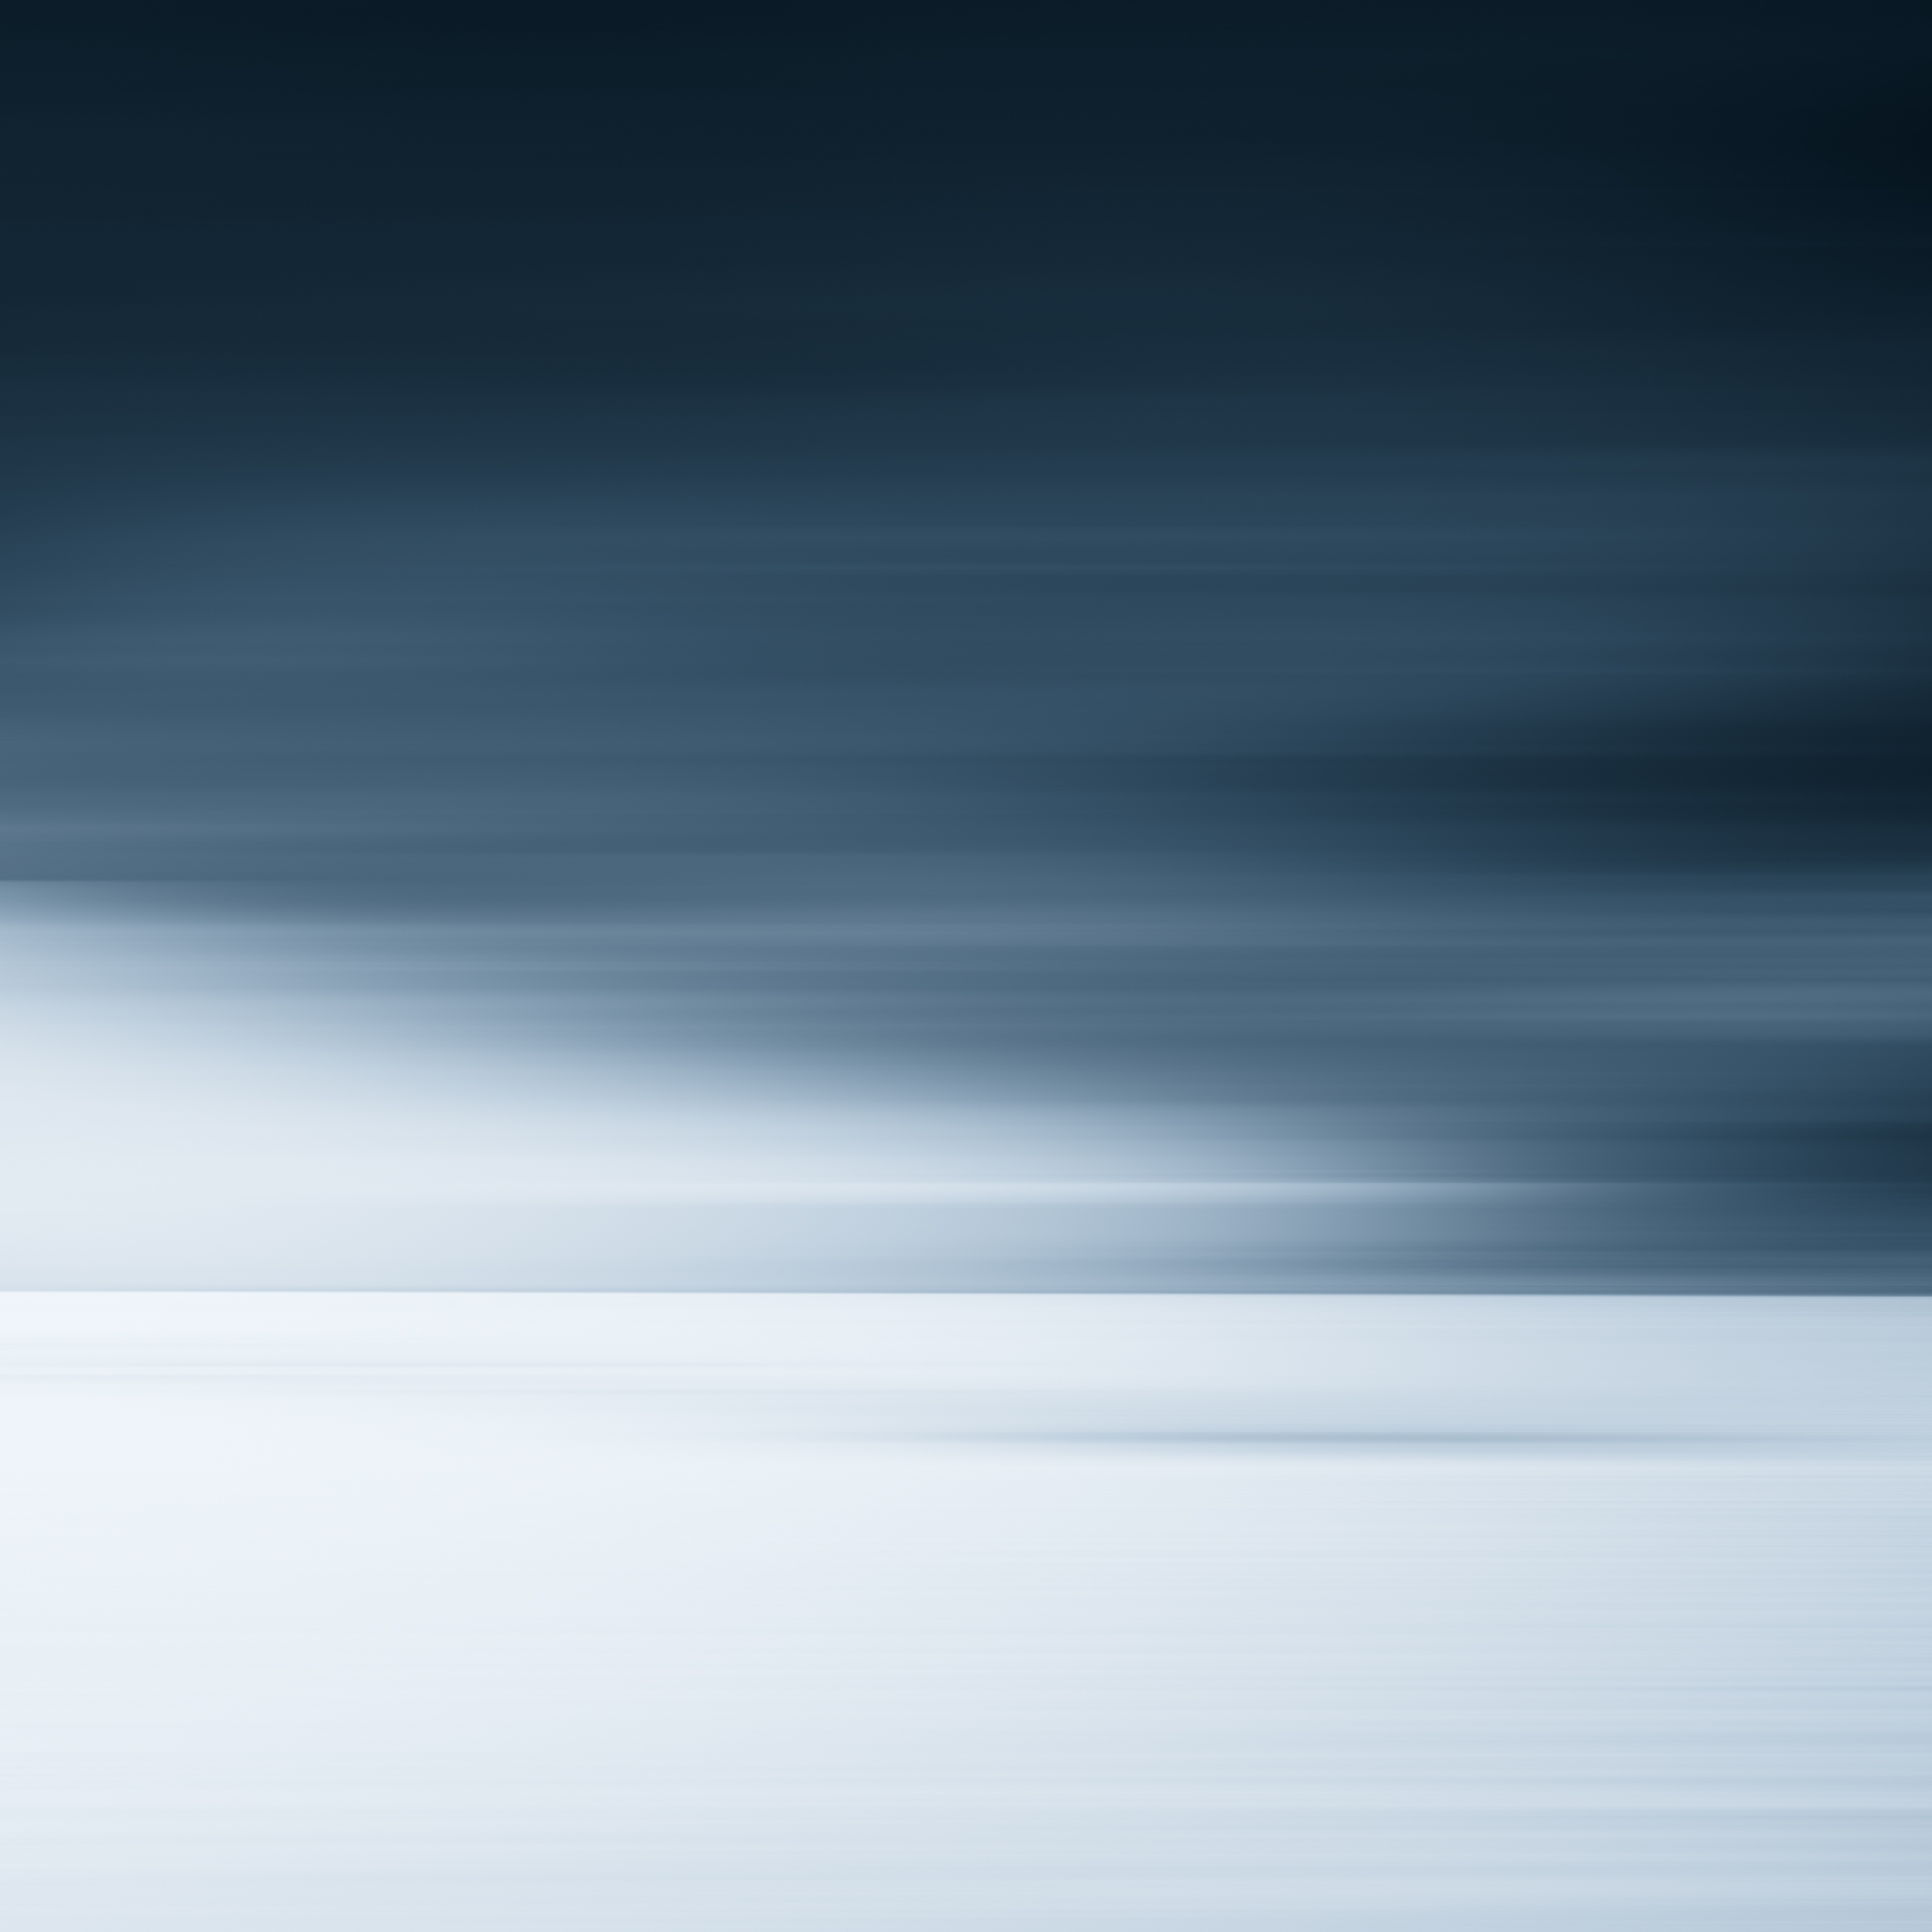 wallpaper size for ipad mini retina gallery